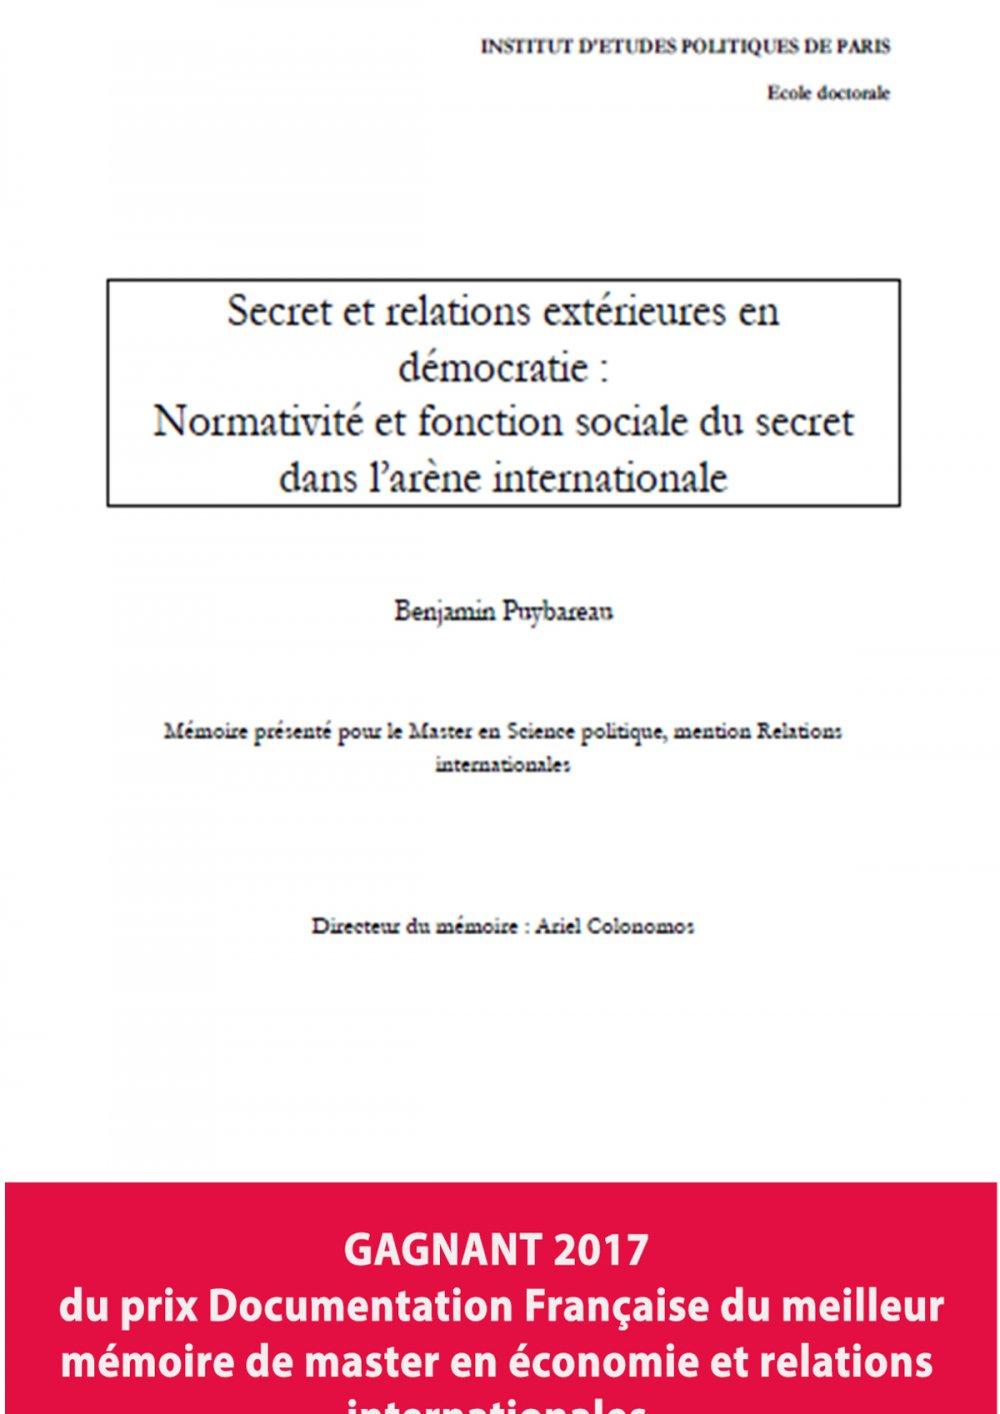 Benjamin PUYBAREAU : Secret et relations extérieures en démocratie